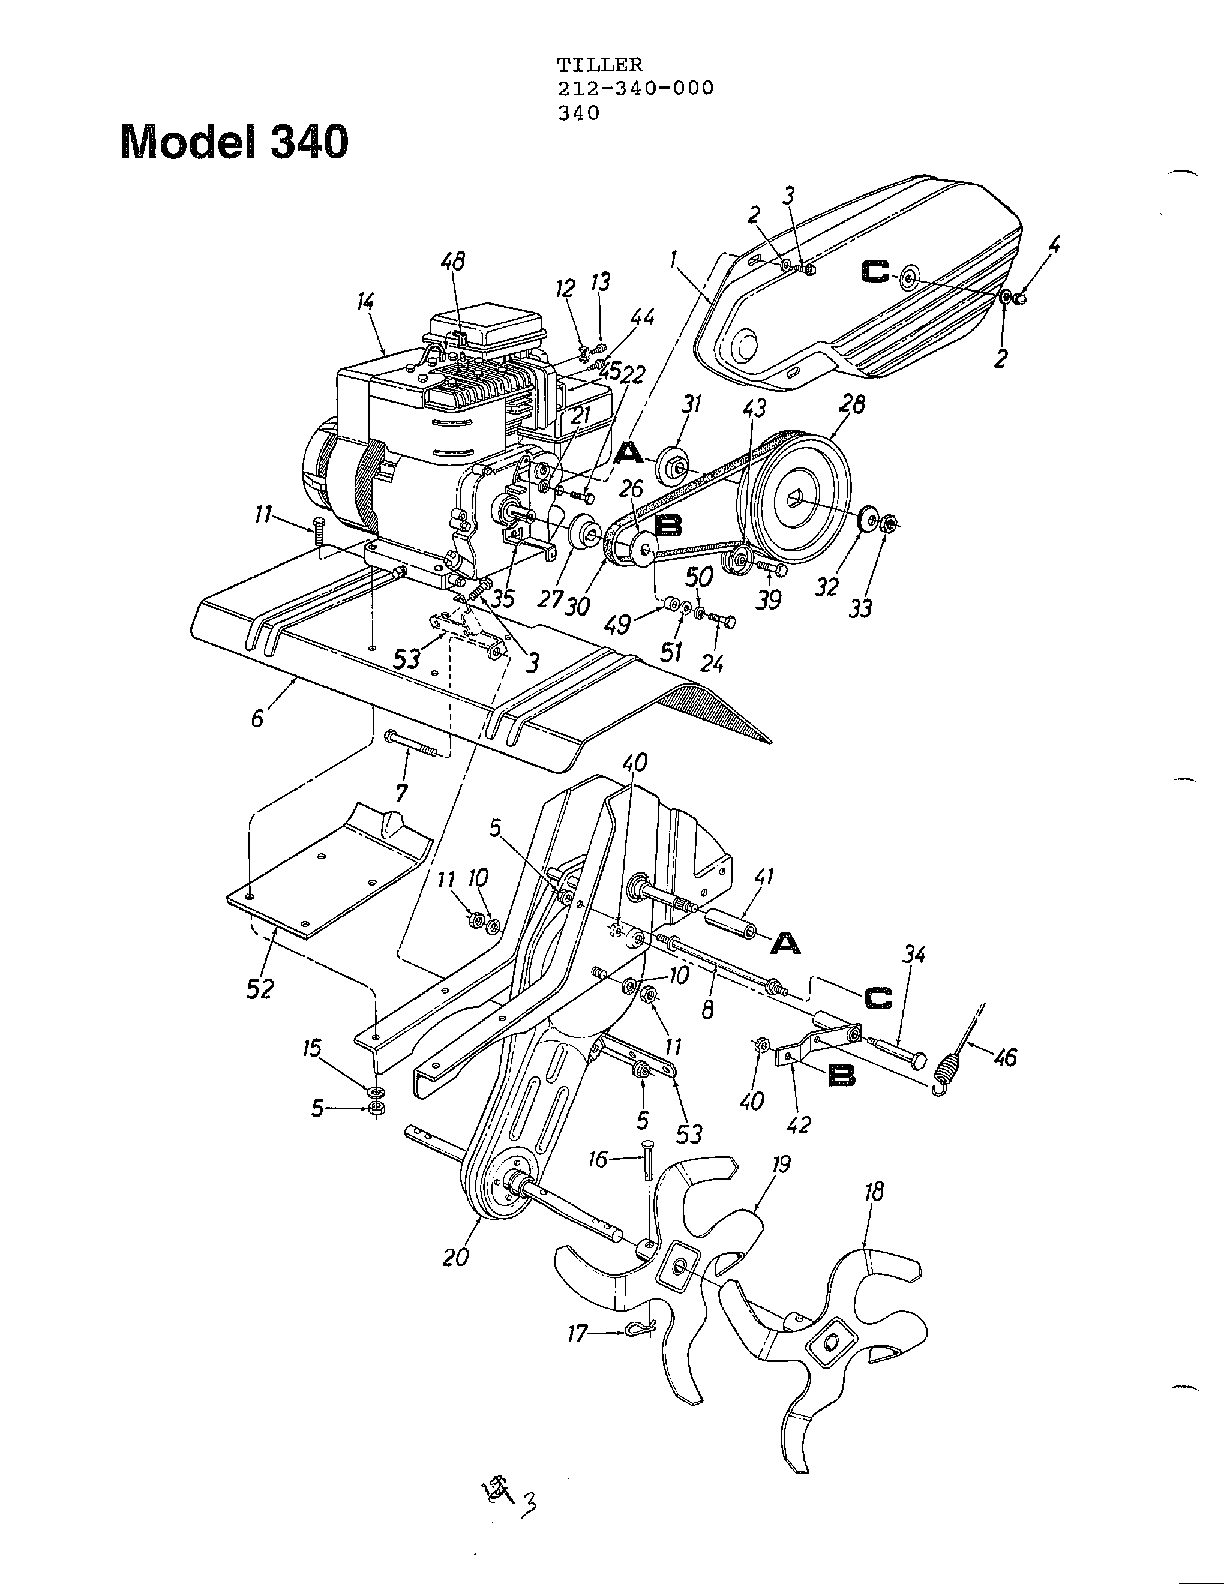 Mtd model 212-340-000 rear tine, gas tiller genuine parts